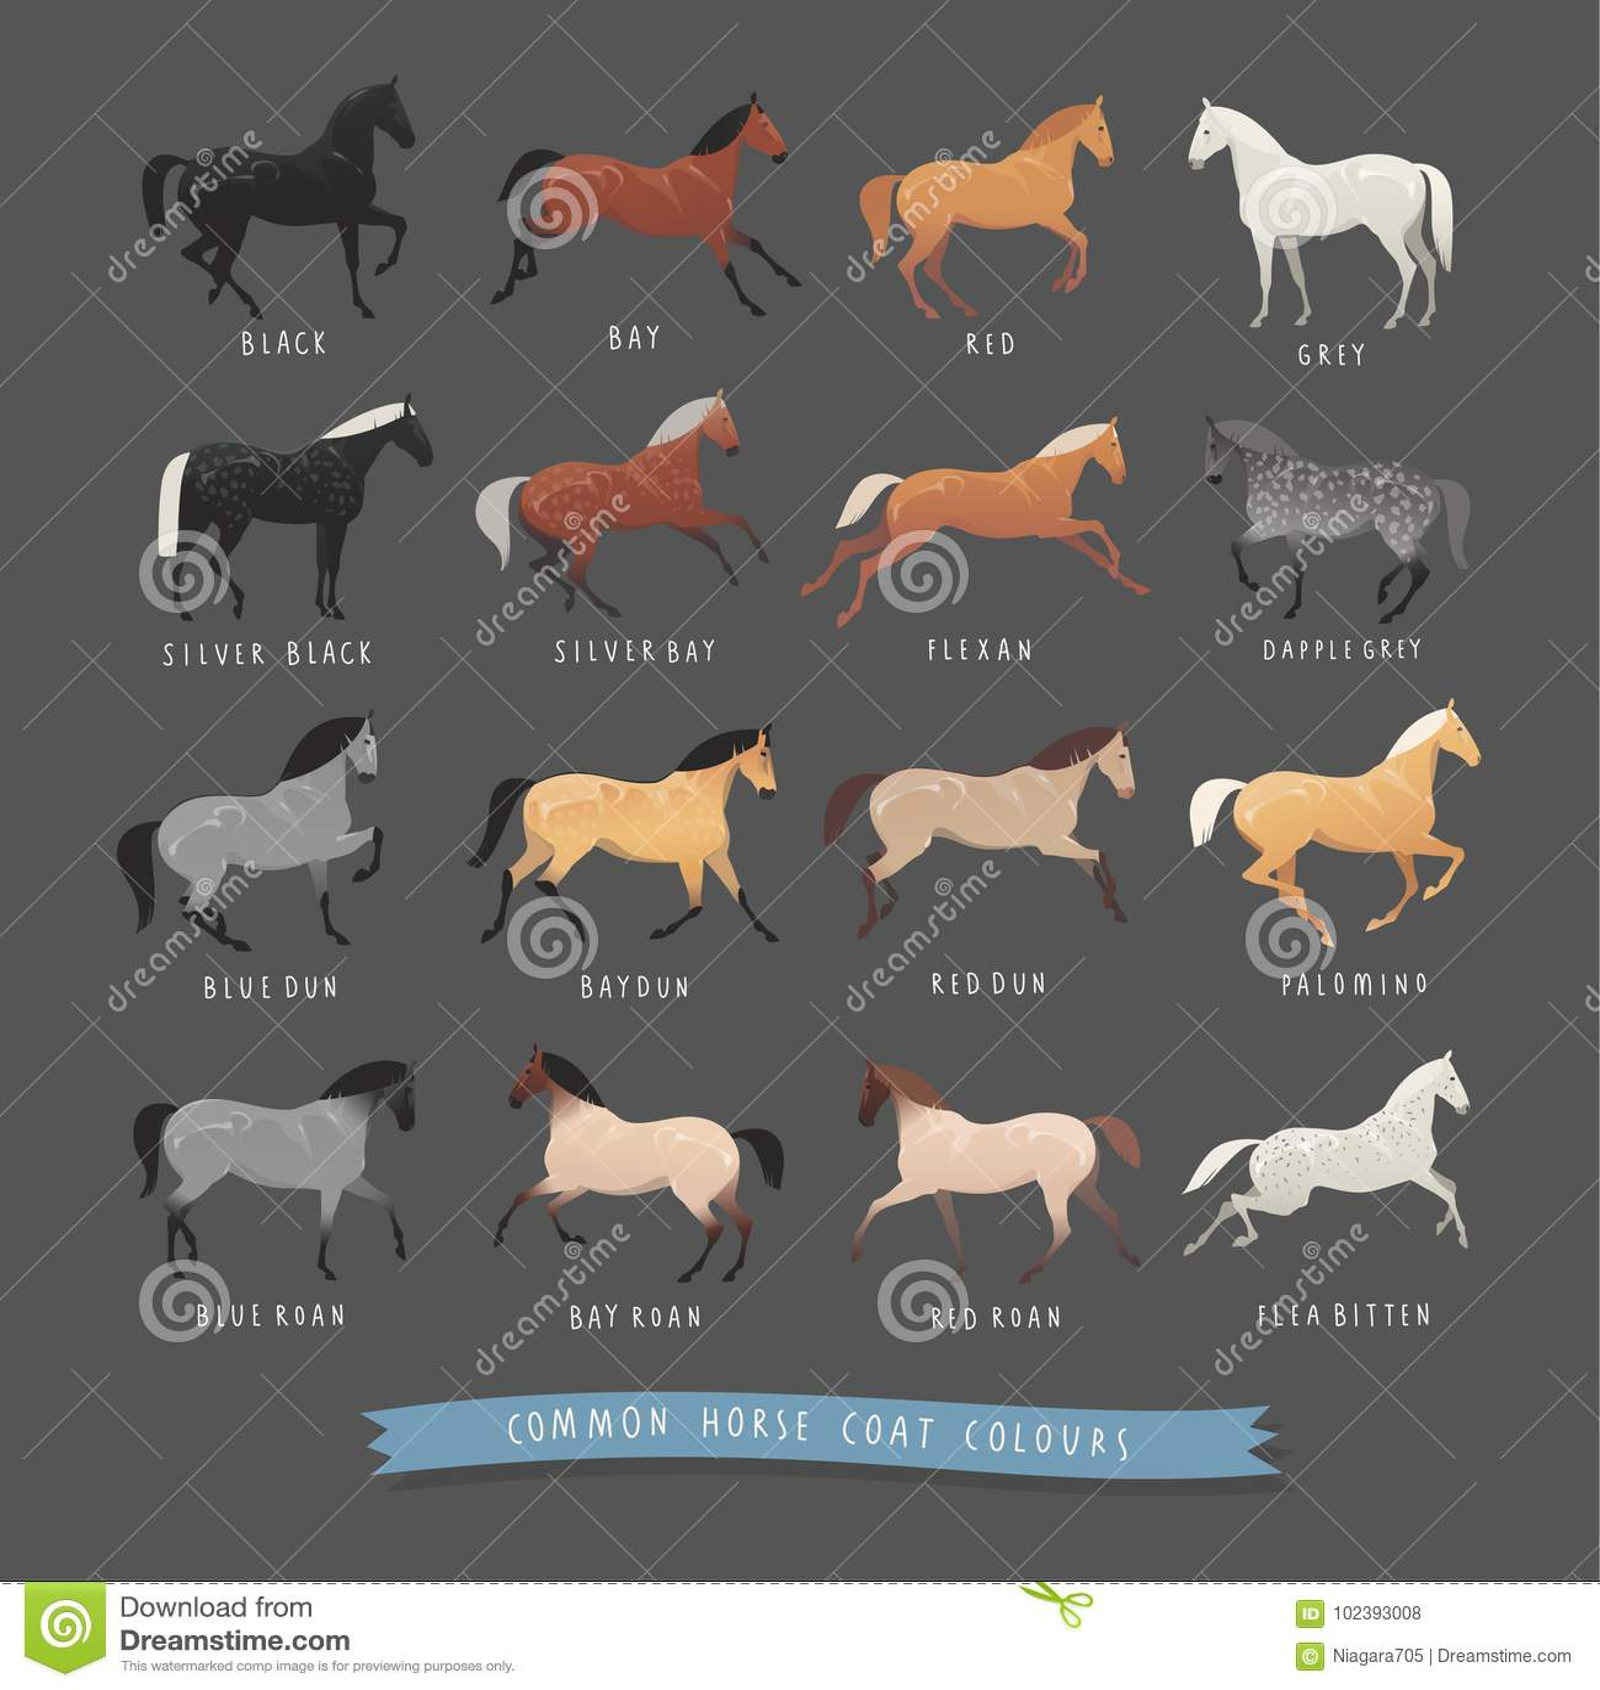 Roan Horse Stock Illustrations 45 Roan Horse Stock Illustrations Vectors Clipart Dreamstime